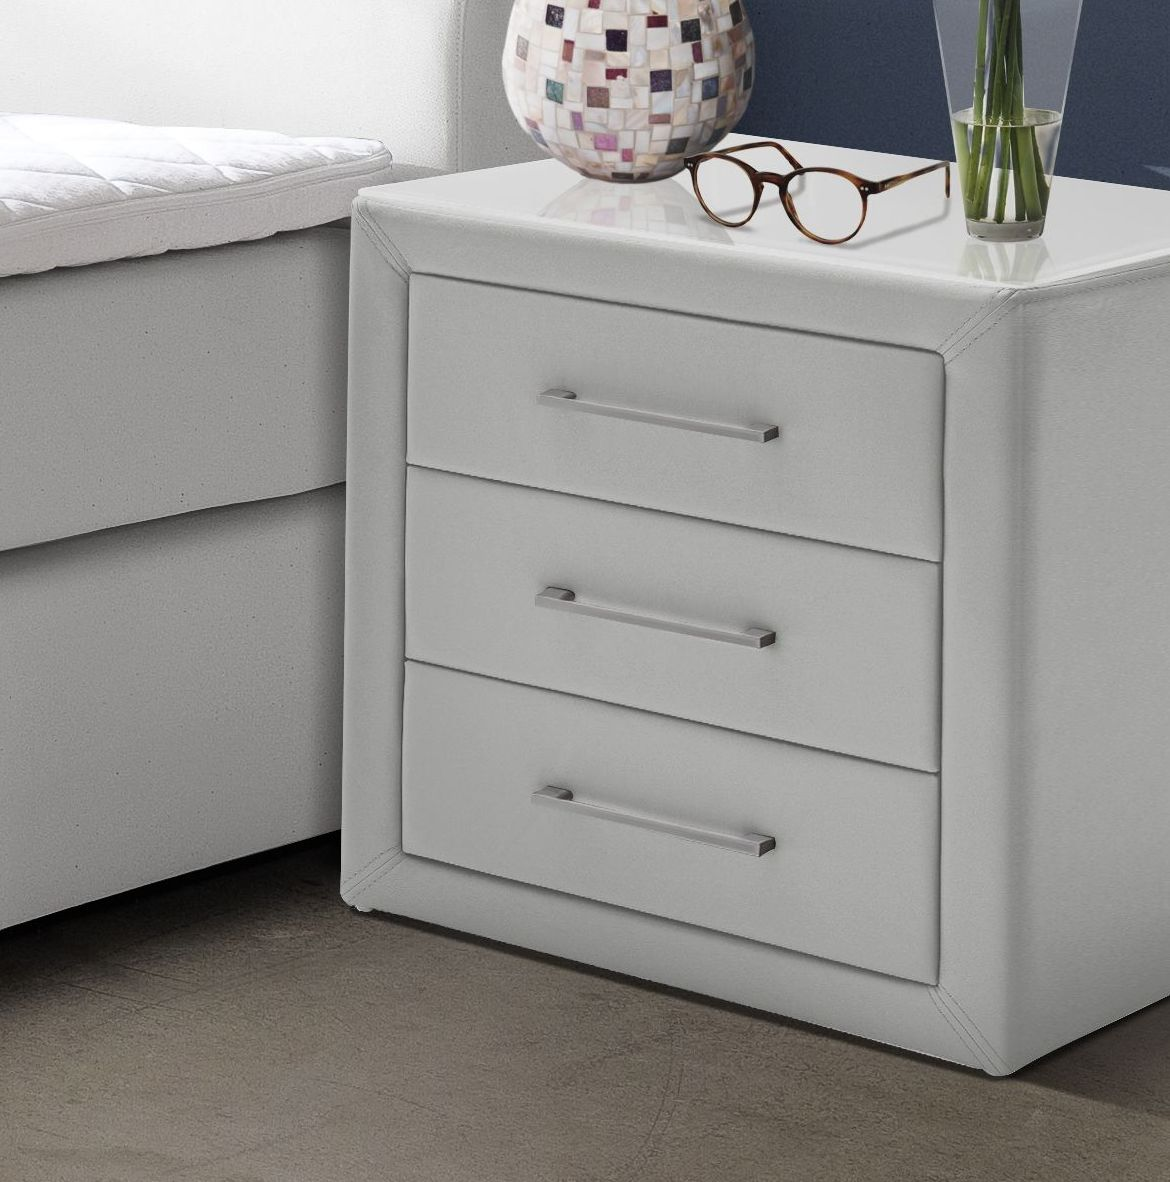 edler boxspring nachttisch mit bezug aus kunstleder rimori. Black Bedroom Furniture Sets. Home Design Ideas